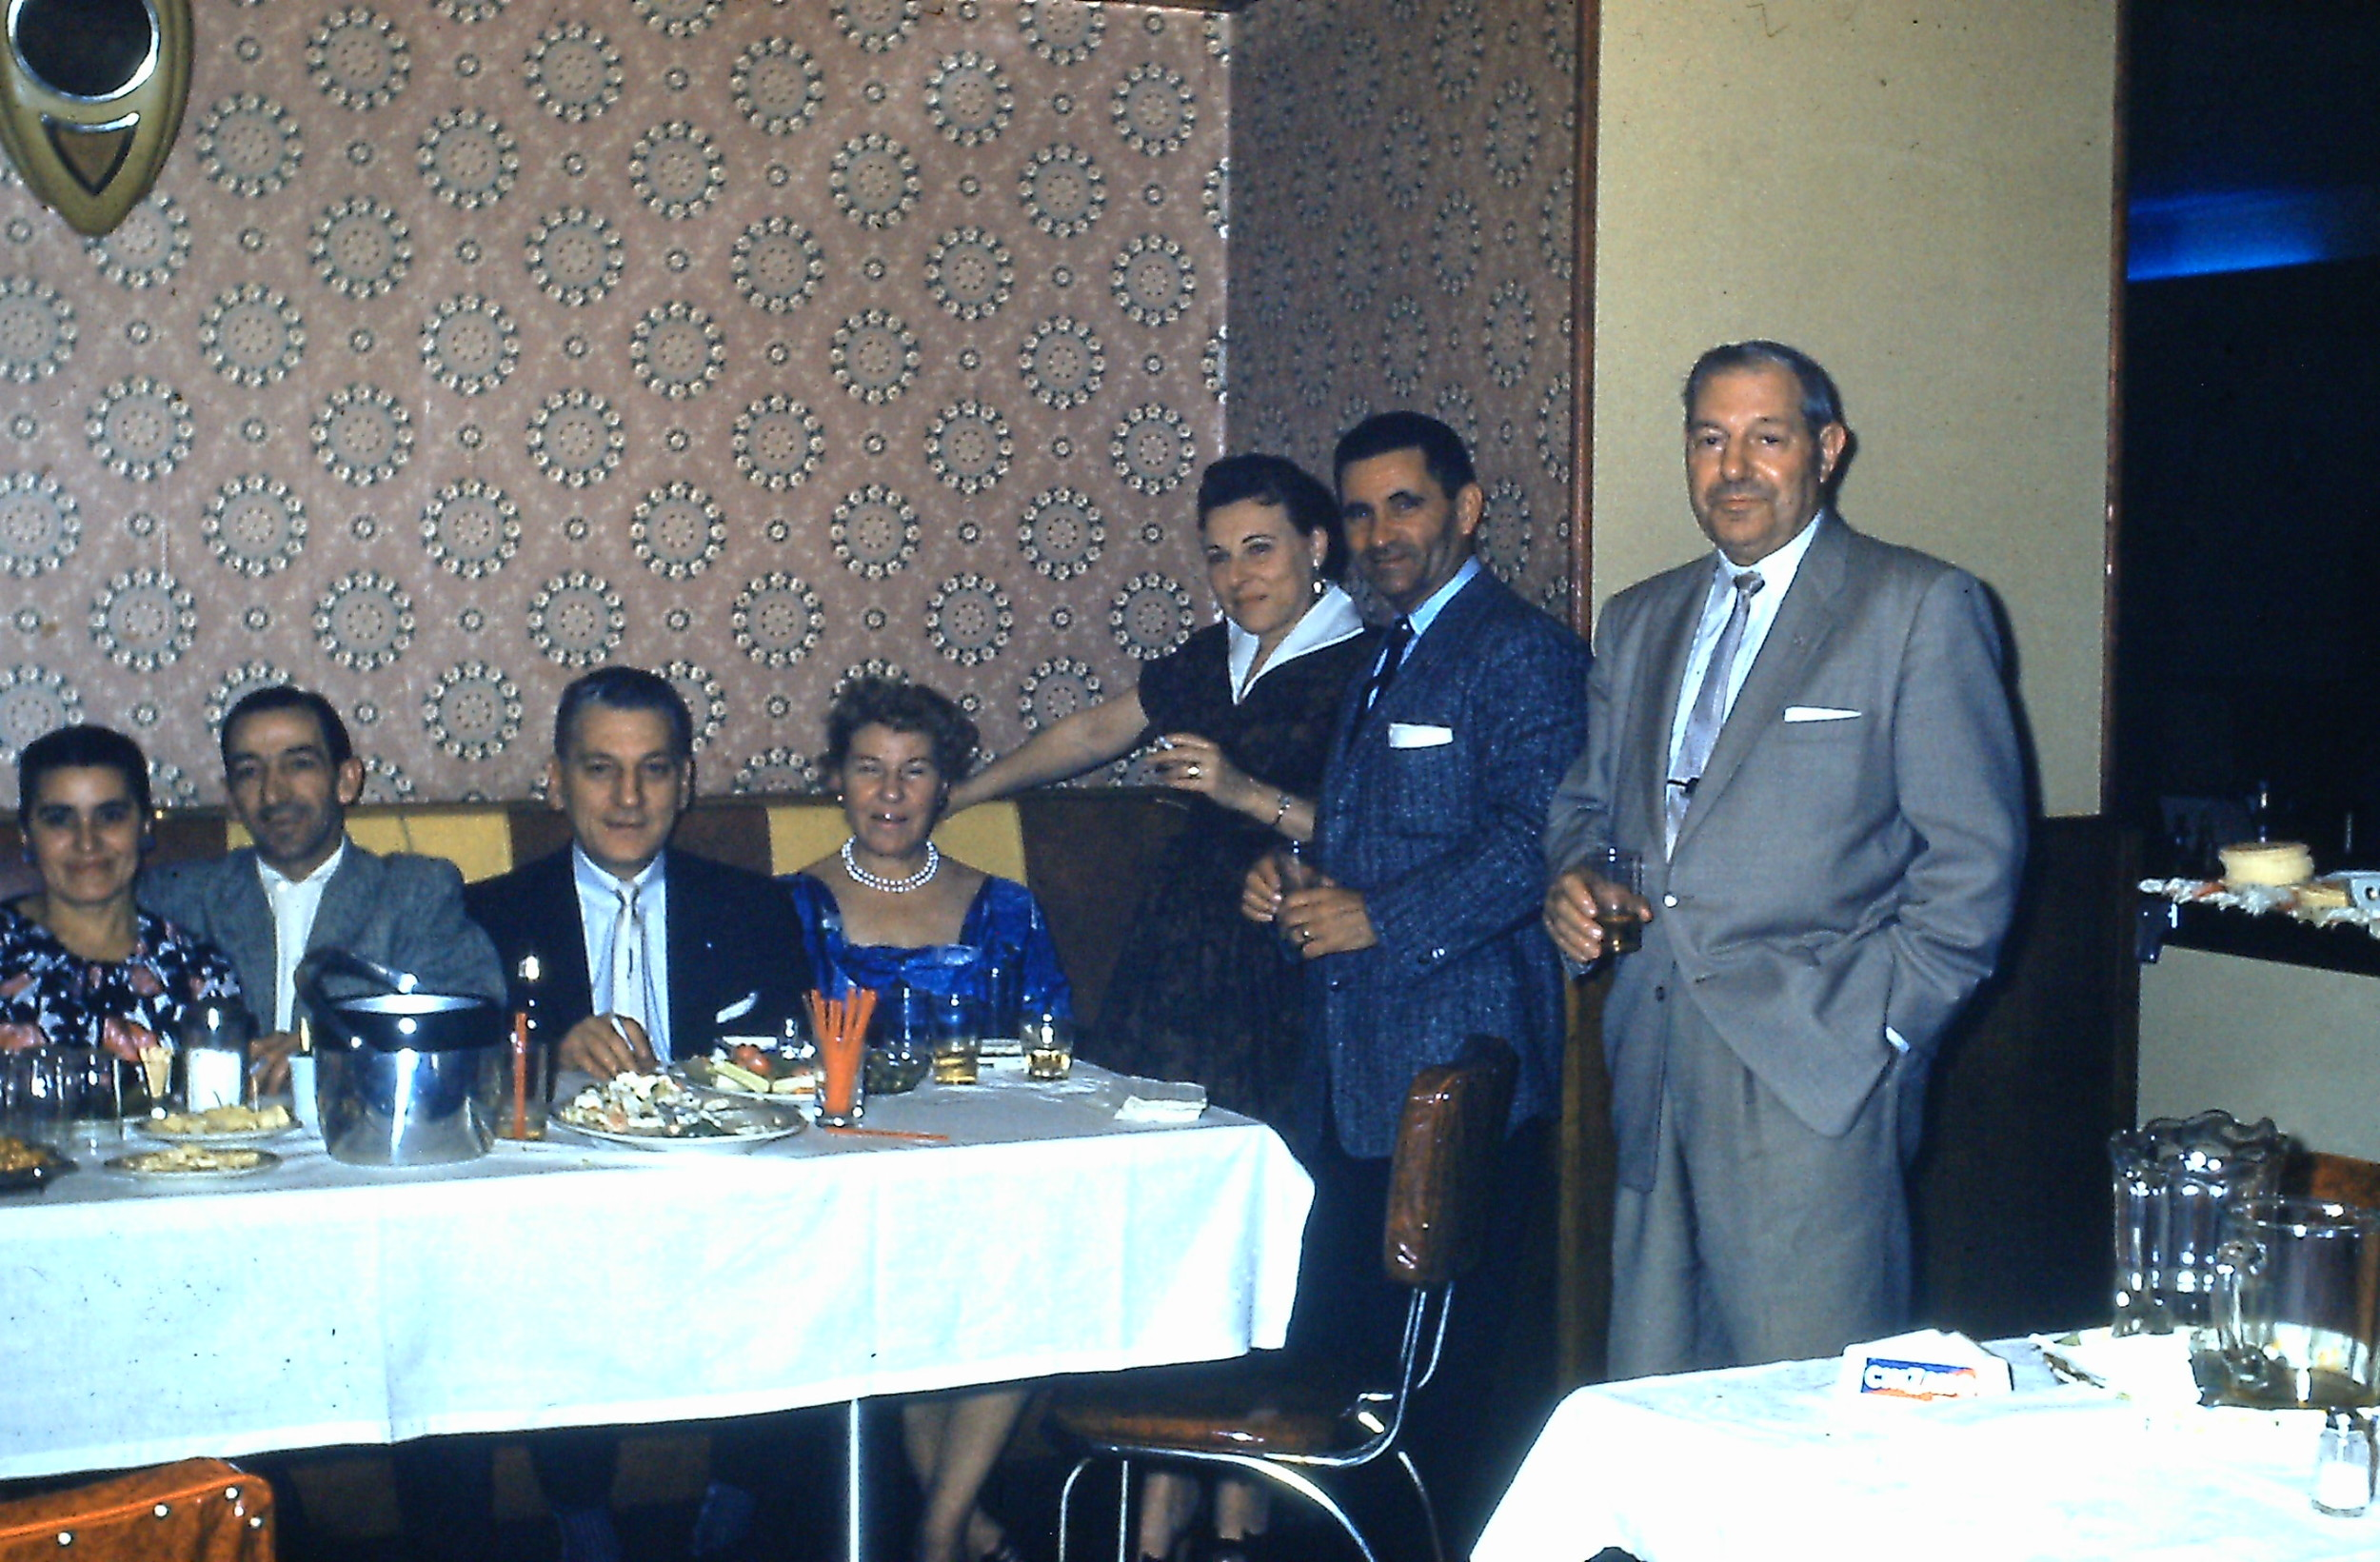 LI Bar back room 1959.JPG